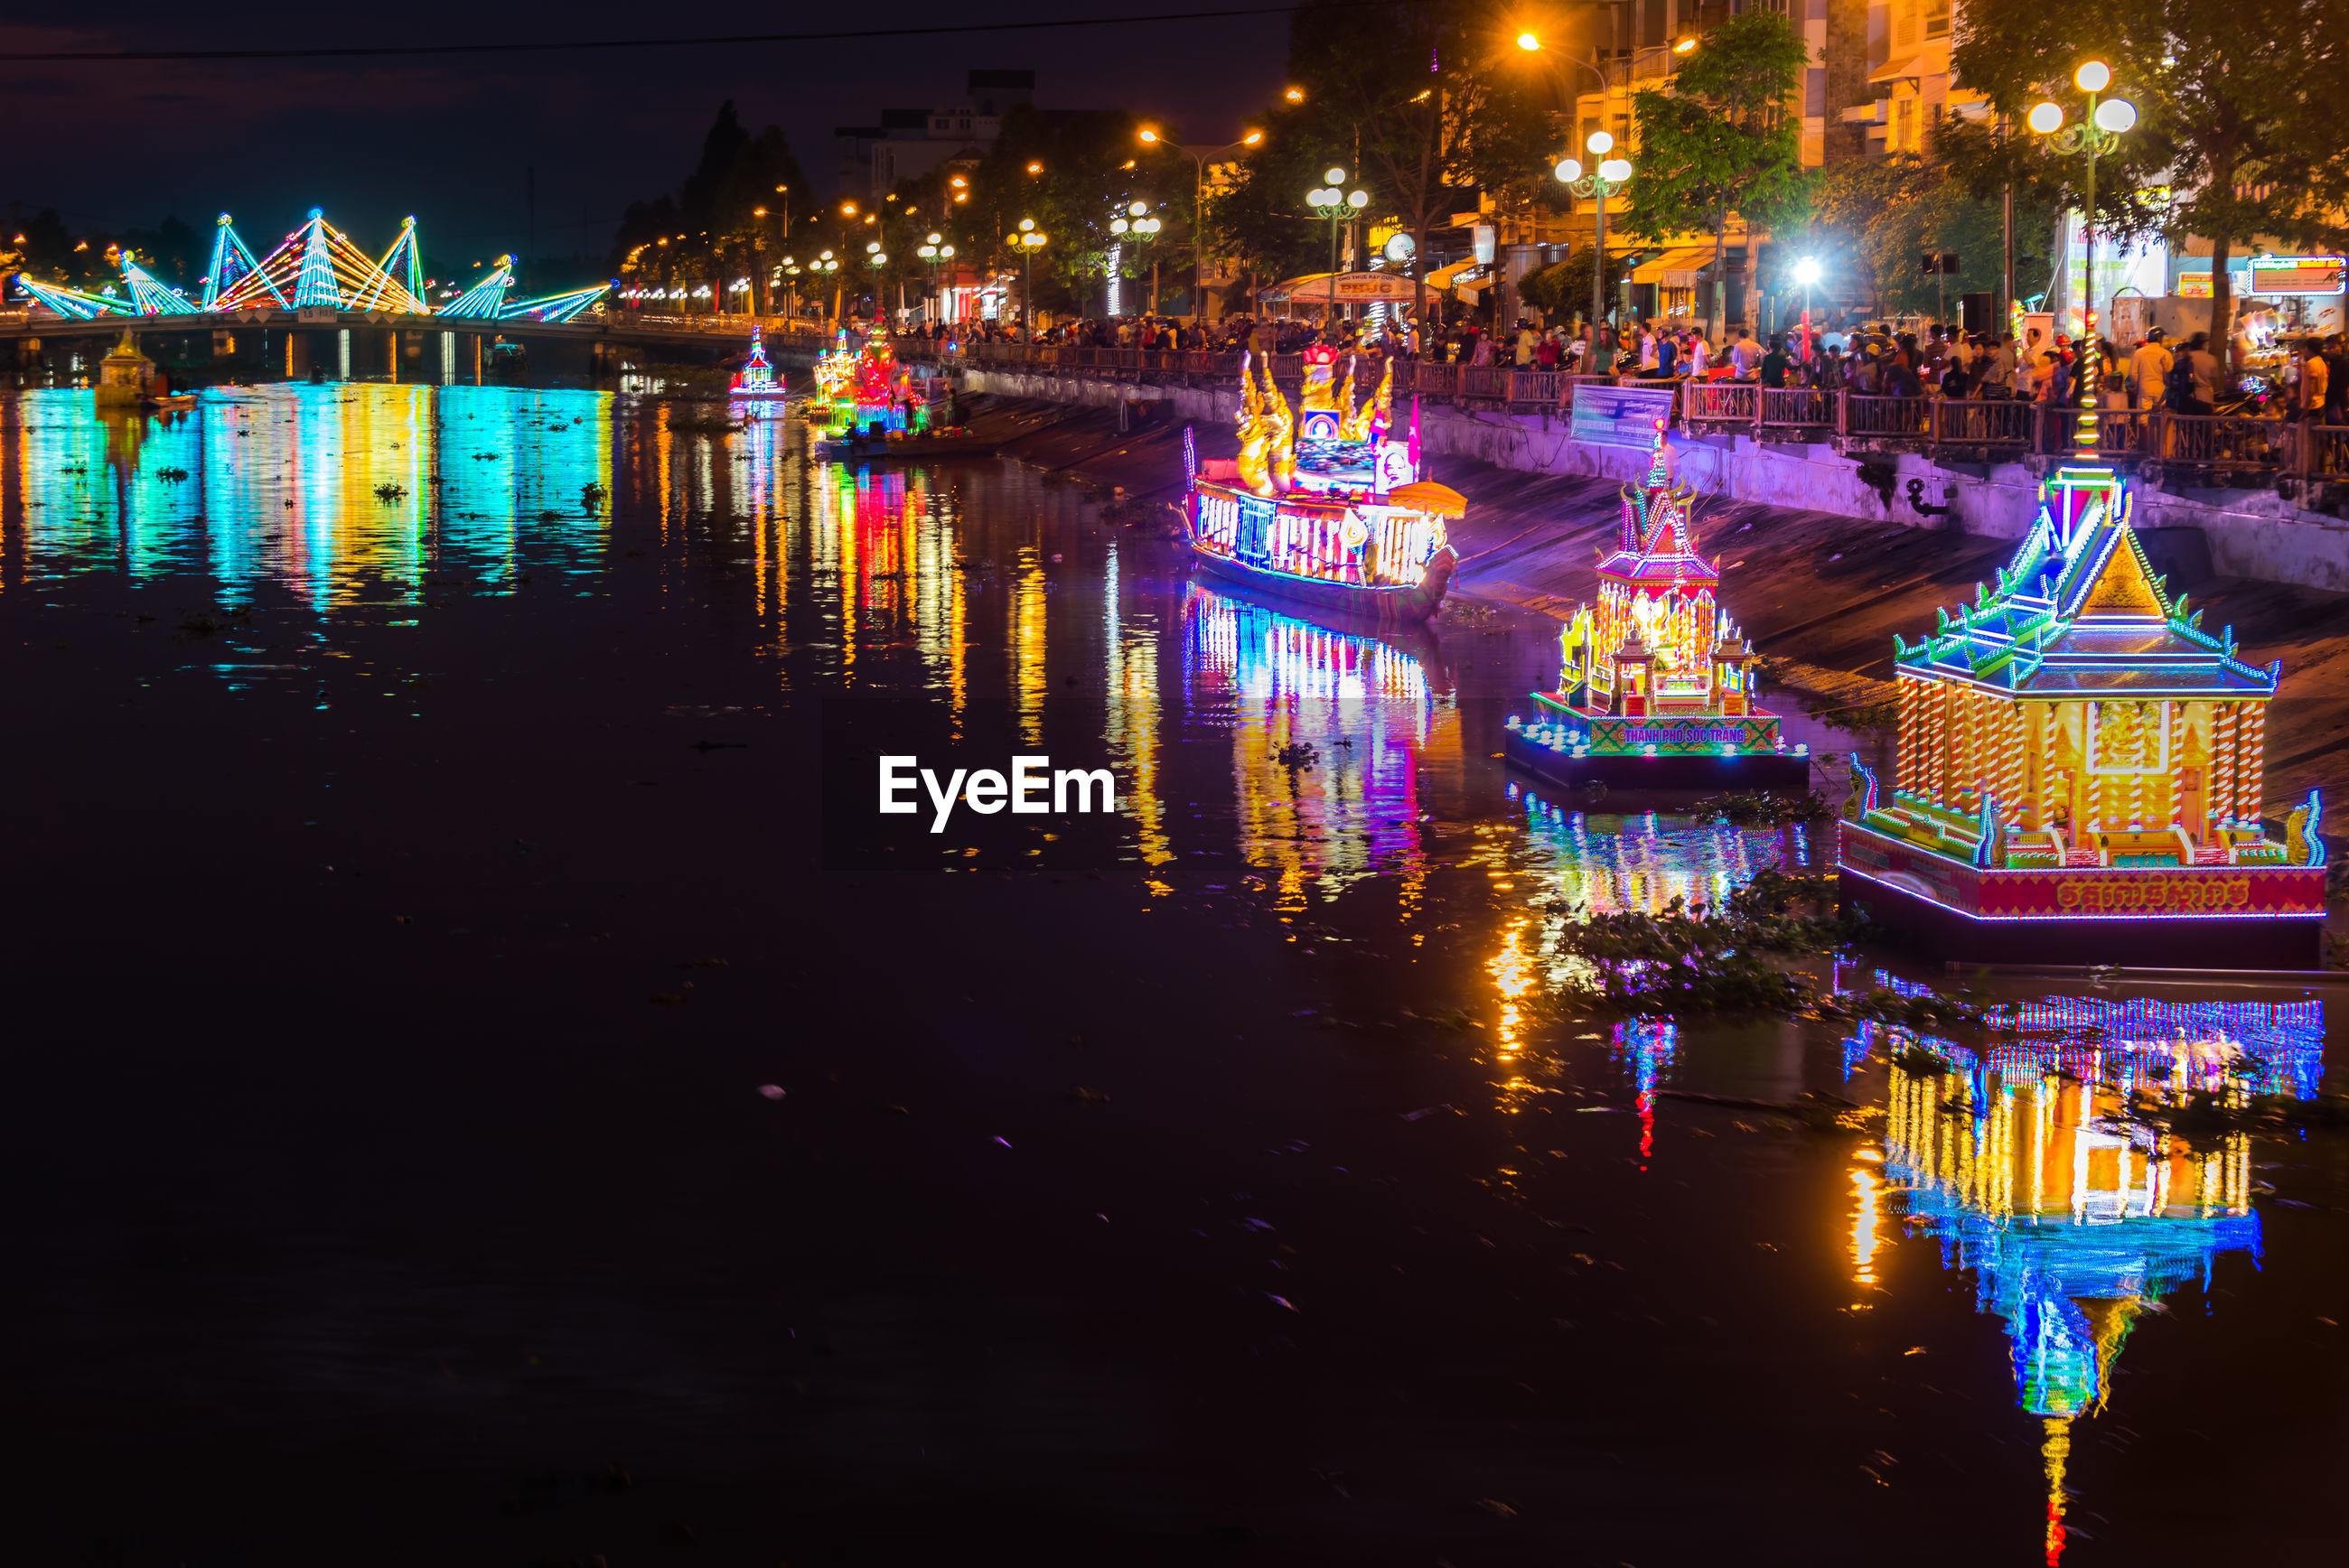 Illuminated buildings by river in city at night soc trang